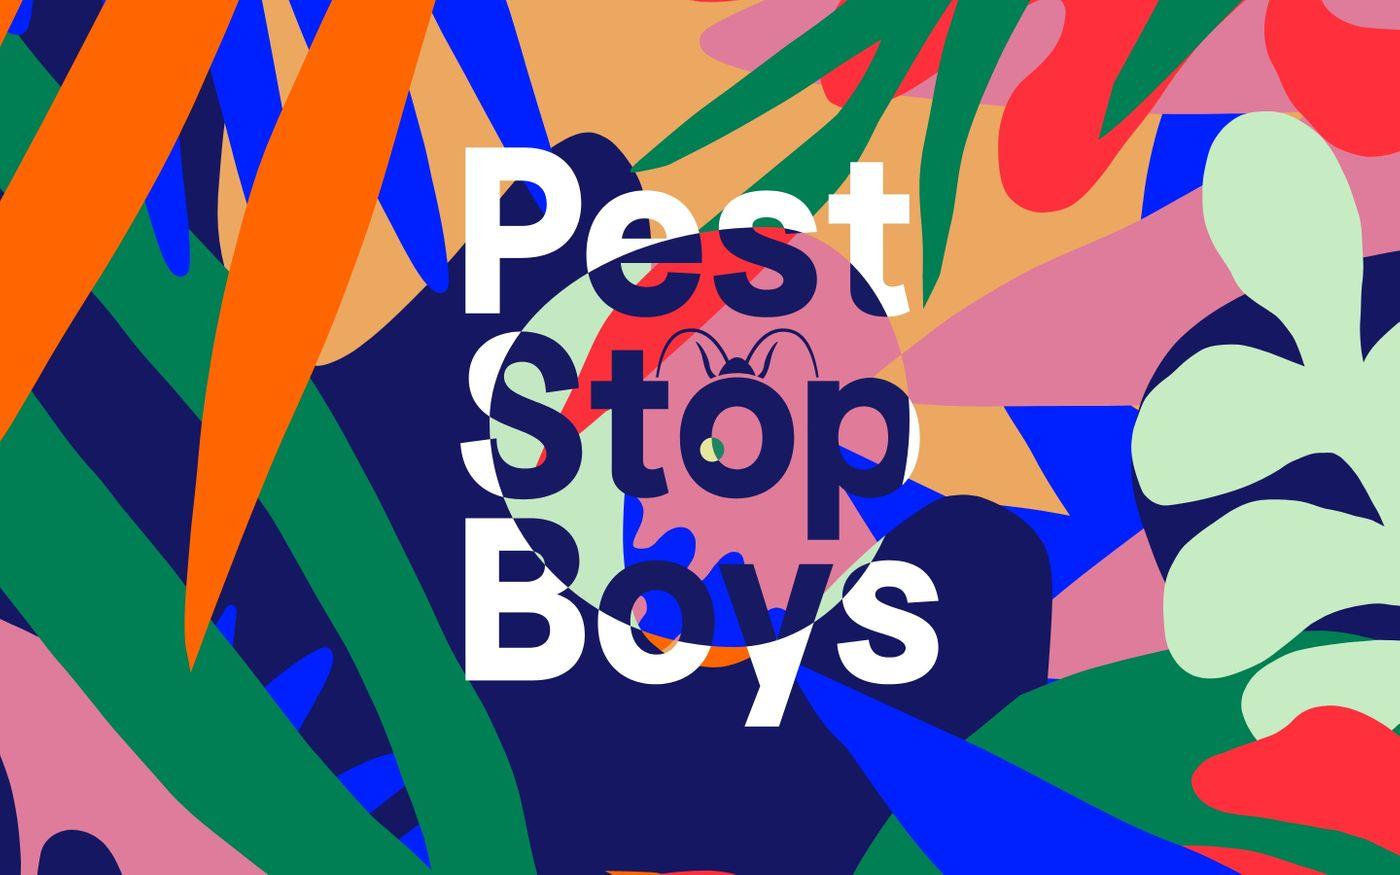 Screenshot of Pest Stop Boys - Pest Control in South East England website